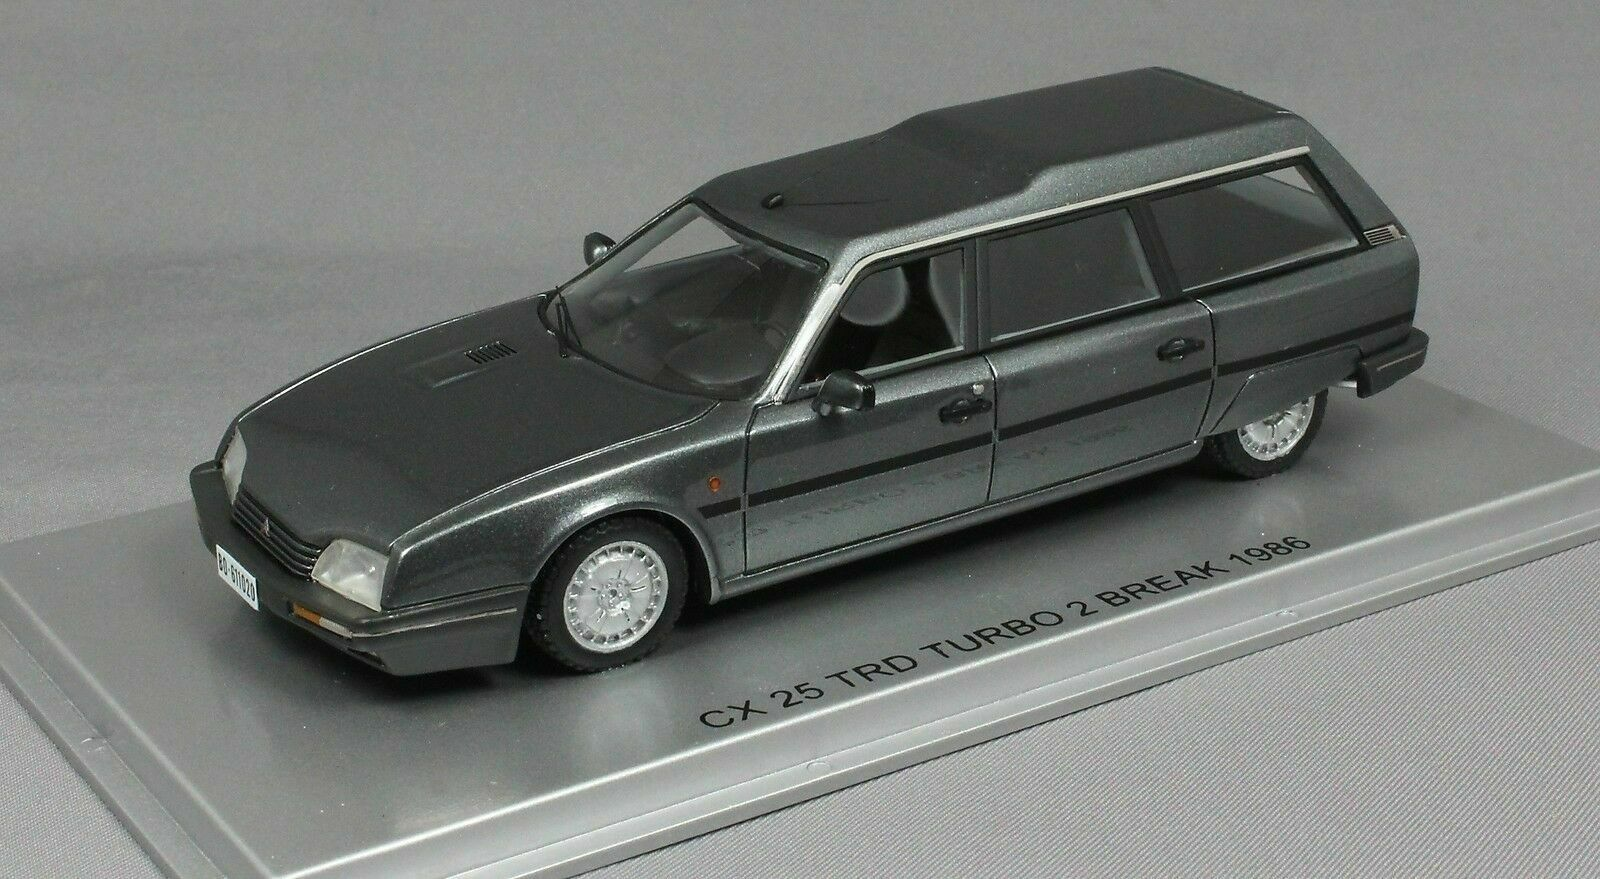 CITROEN CX 25 TRD TURBO 2 BREAK 1986 gris METAL EVB KESS KE43011020 1 43 RESINE